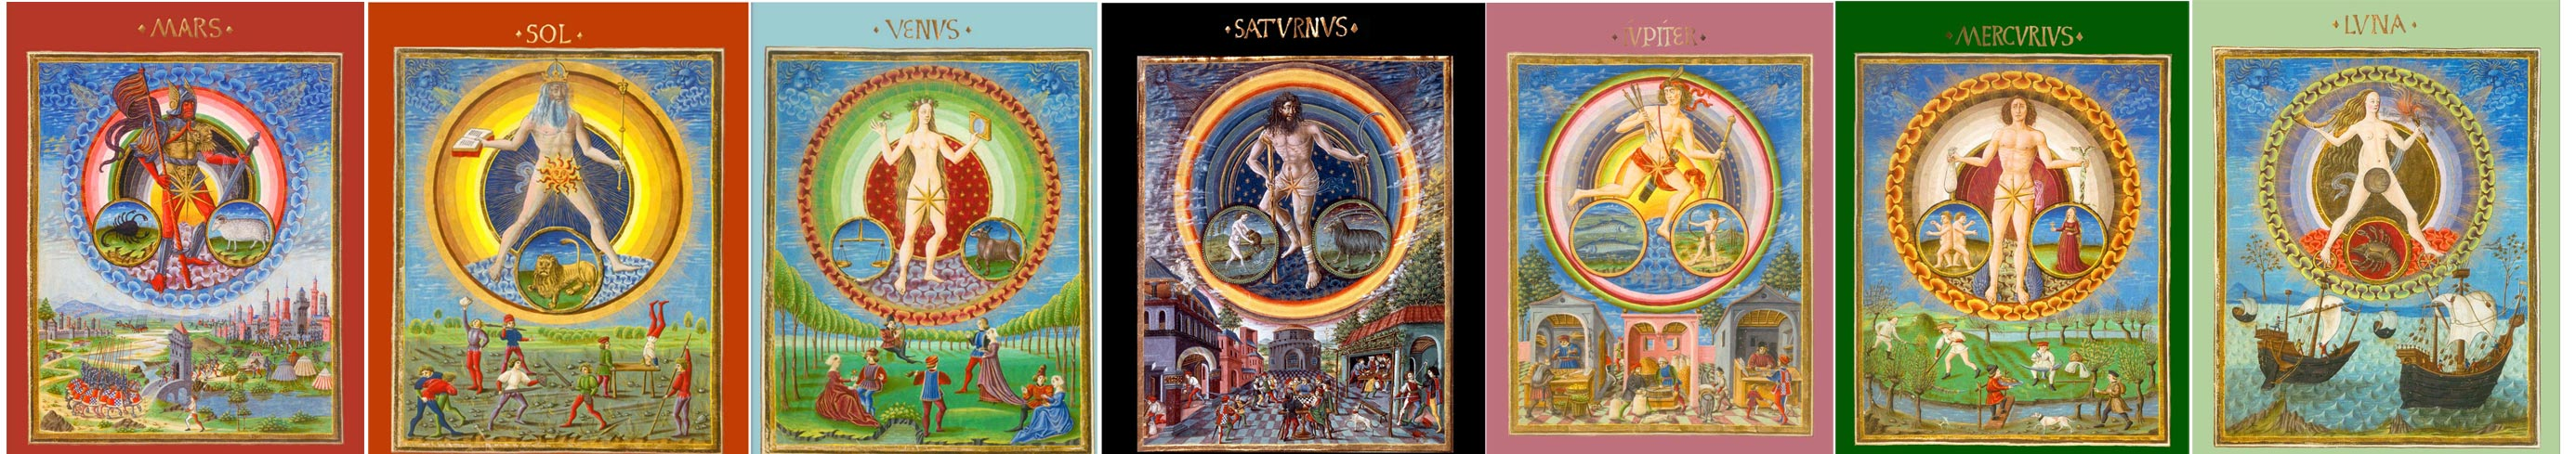 De Sphaera Mundi tiles